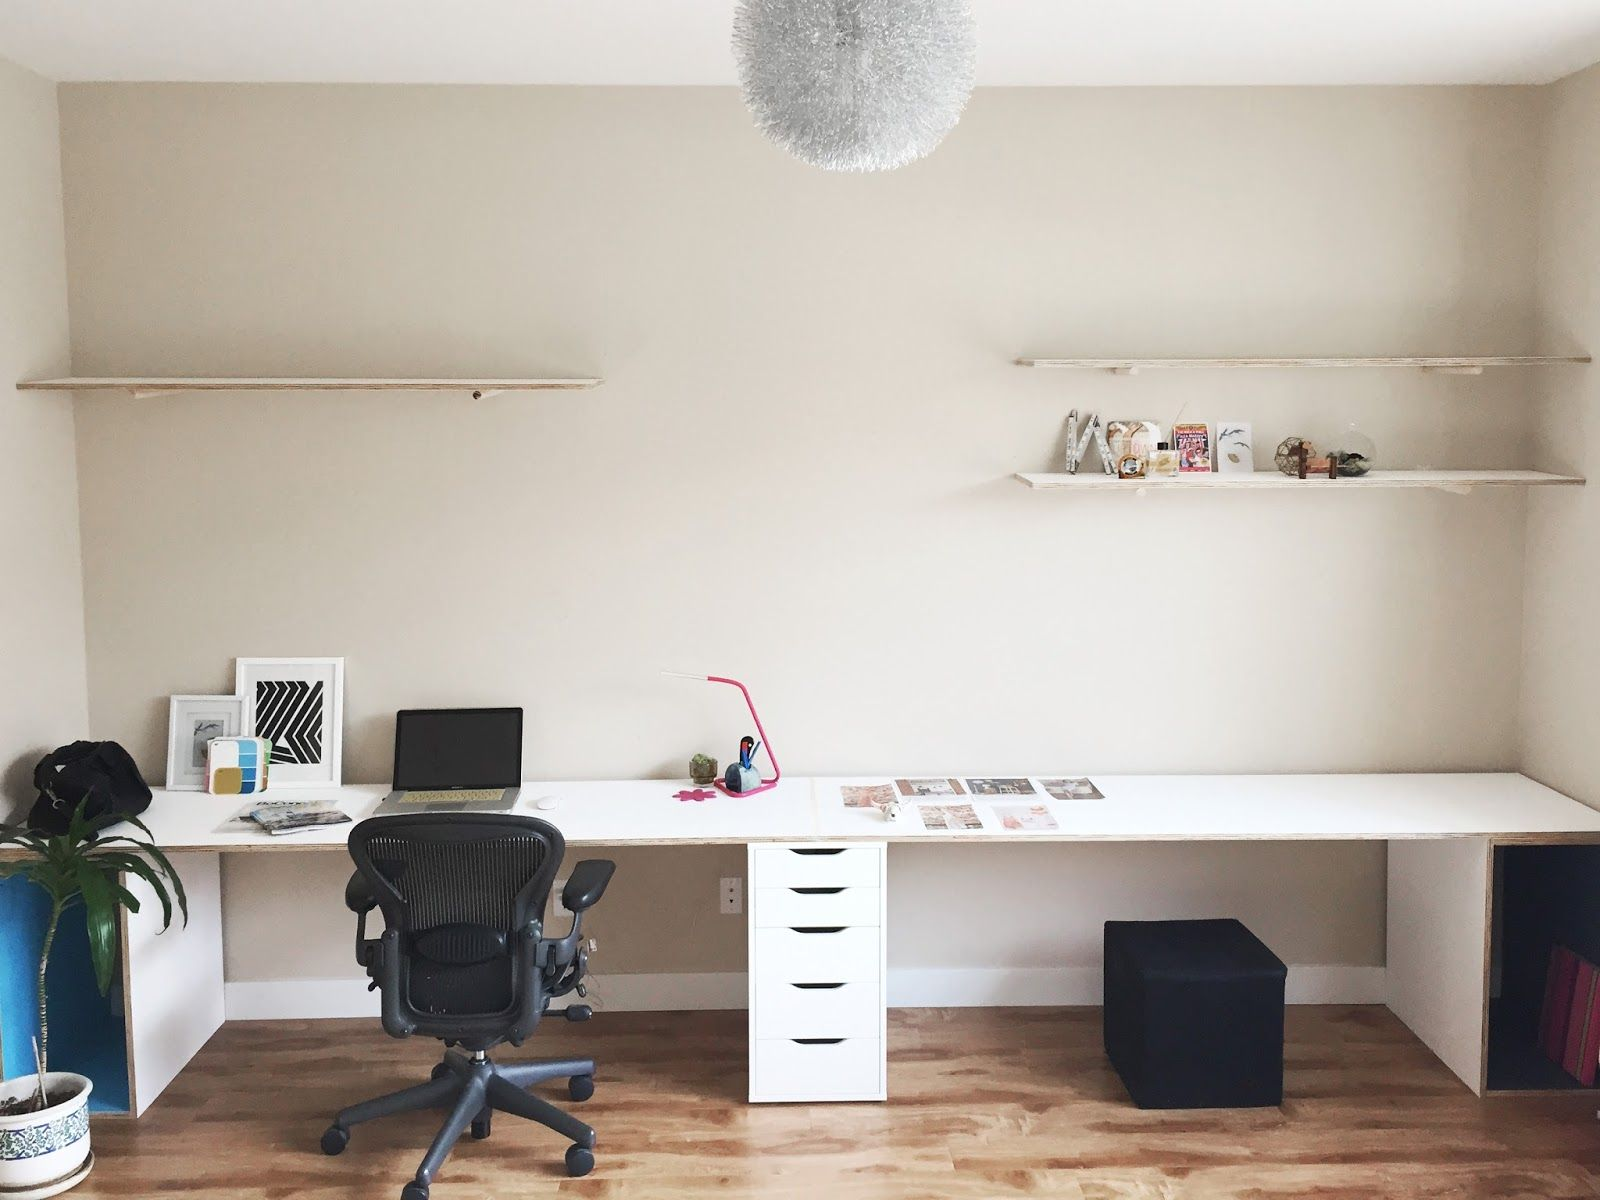 Built Ins Plywood Desk With Storage Ikea Hack Toolsandrags Plywood Desk Home Office Storage Bookshelf Desk